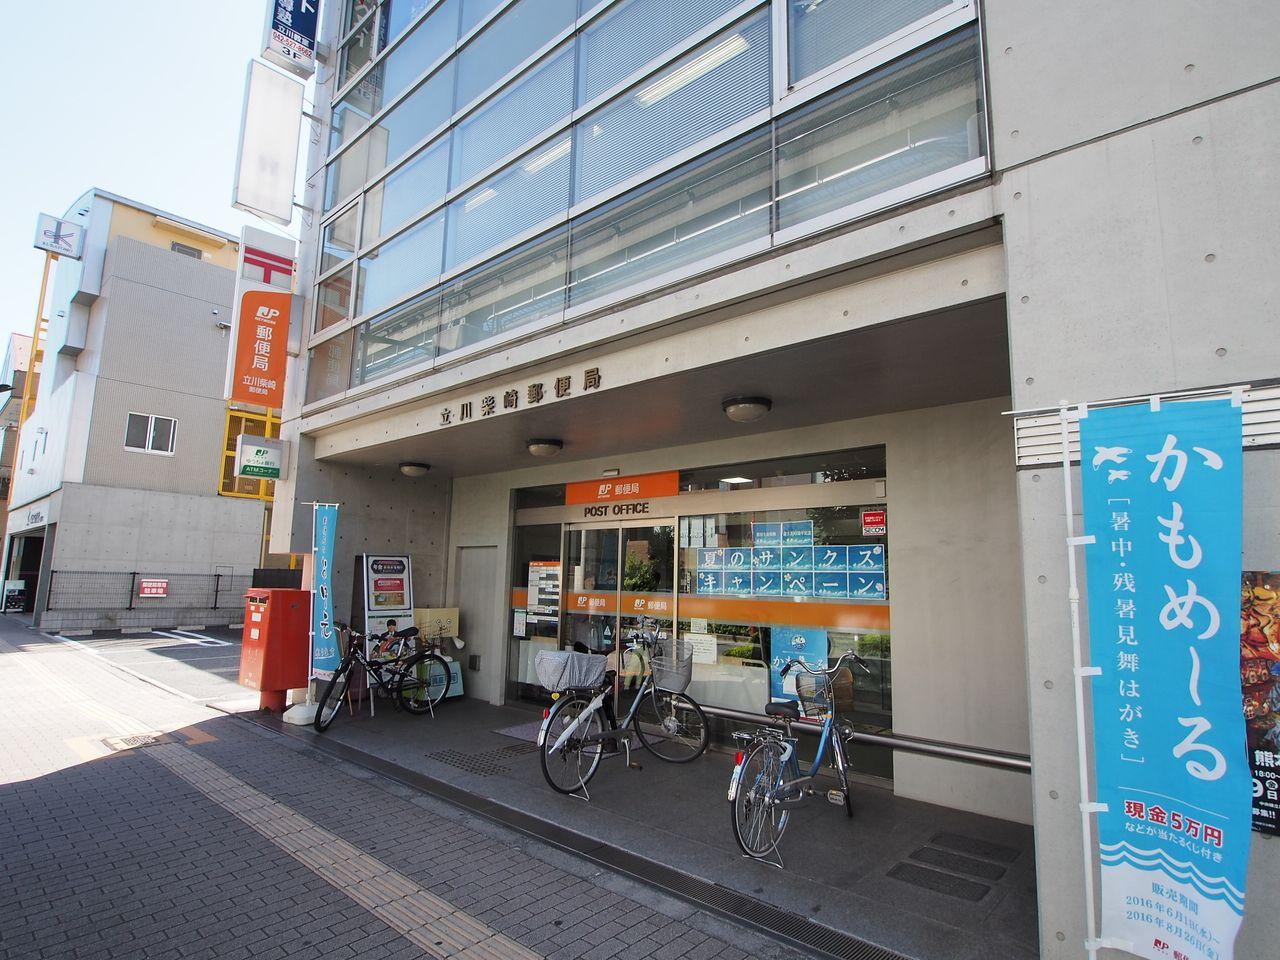 立川駅南口の郵便局